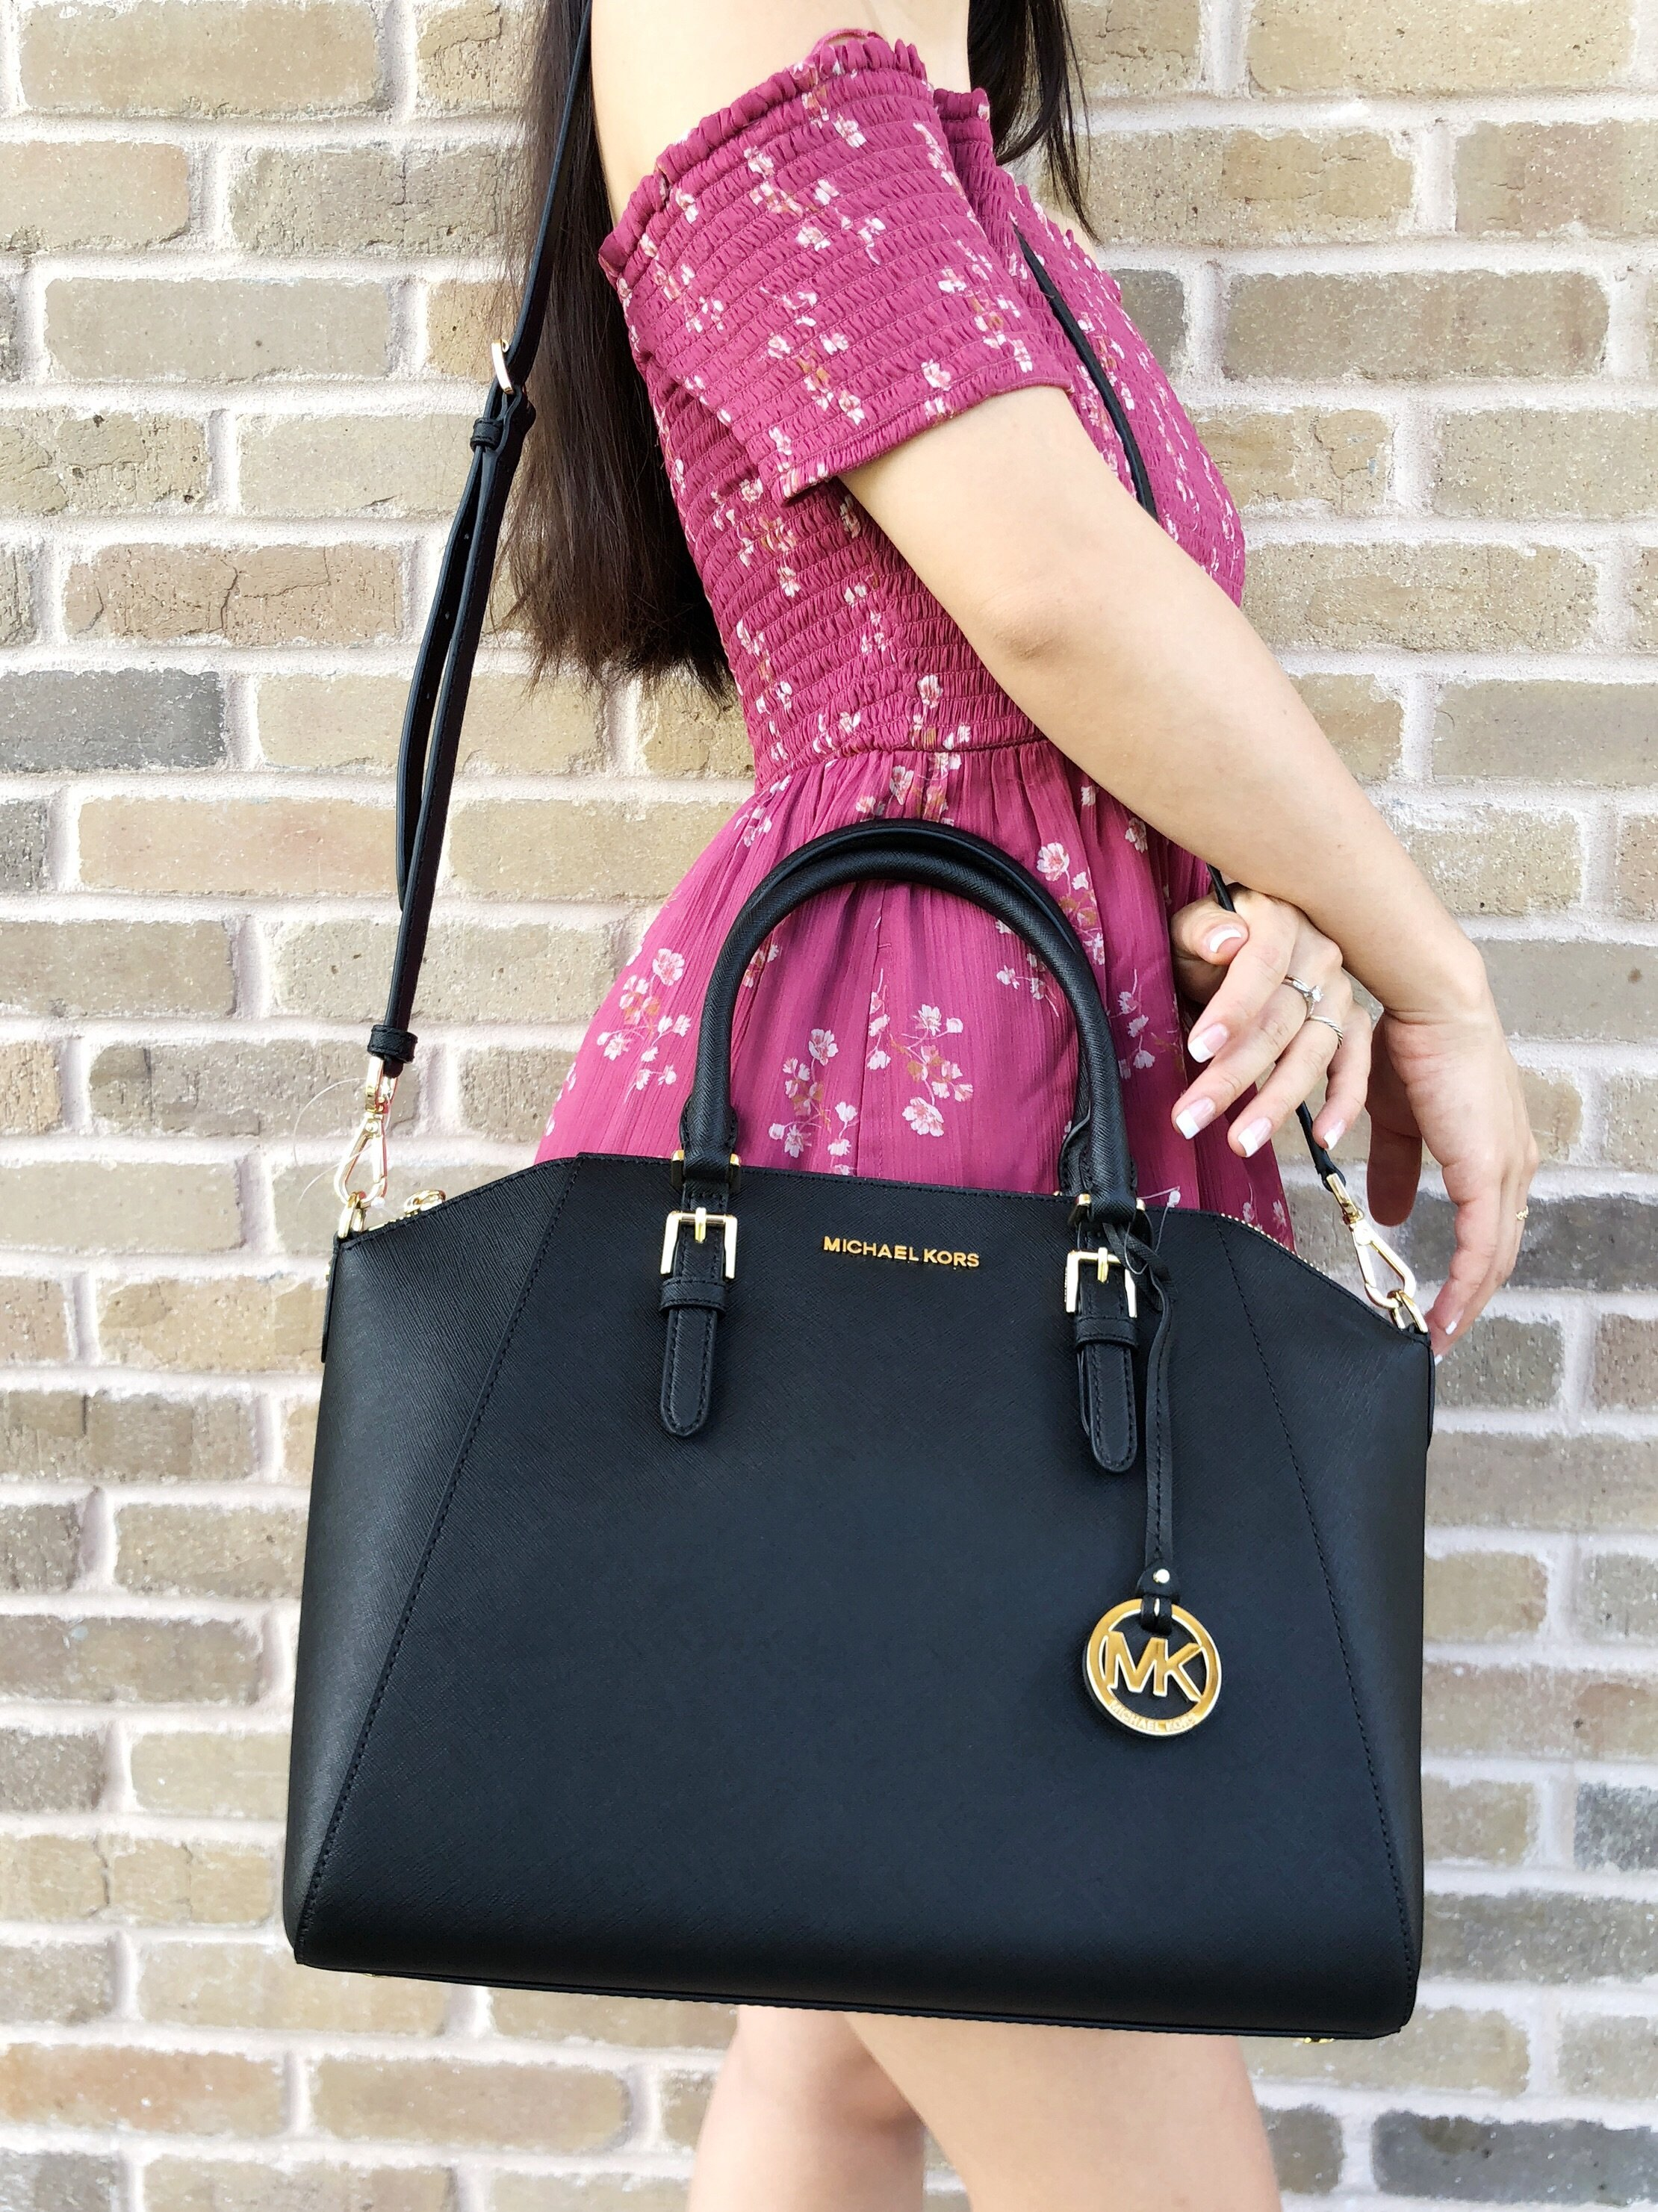 7b5bad29ed33 Gaby s Bags  Michael Kors Large Ciara Top Zip Satchel Black Saffiano ...